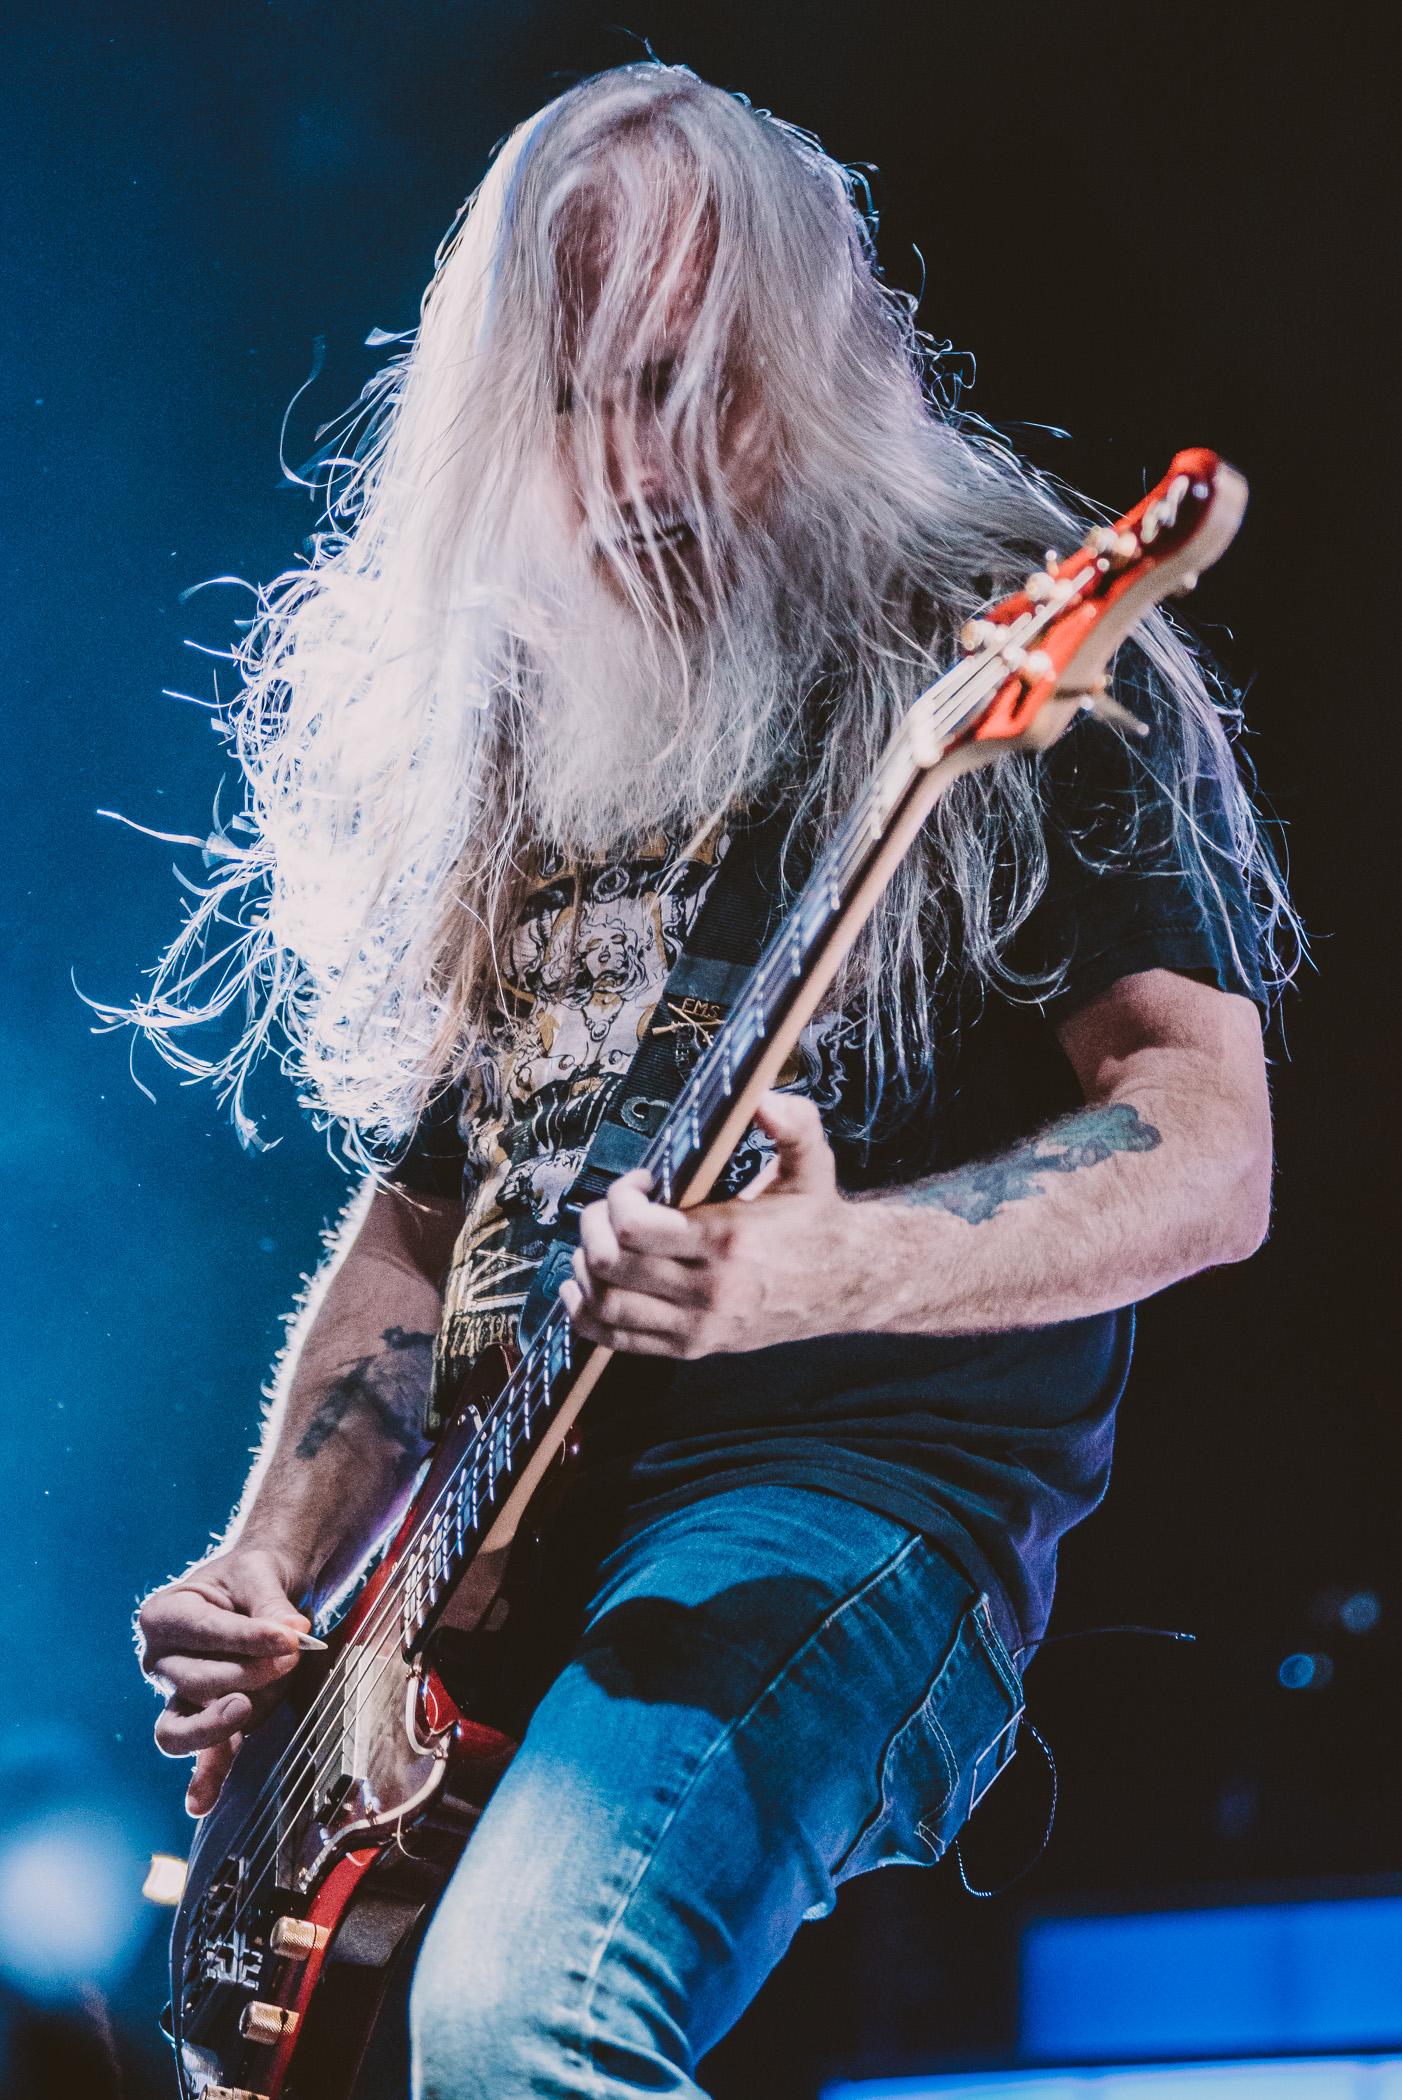 1_Lamb_Of_God-Pacific_Coliseum-Vancouver-Timothy_Nguyen-20180516 (26 of 47).jpg